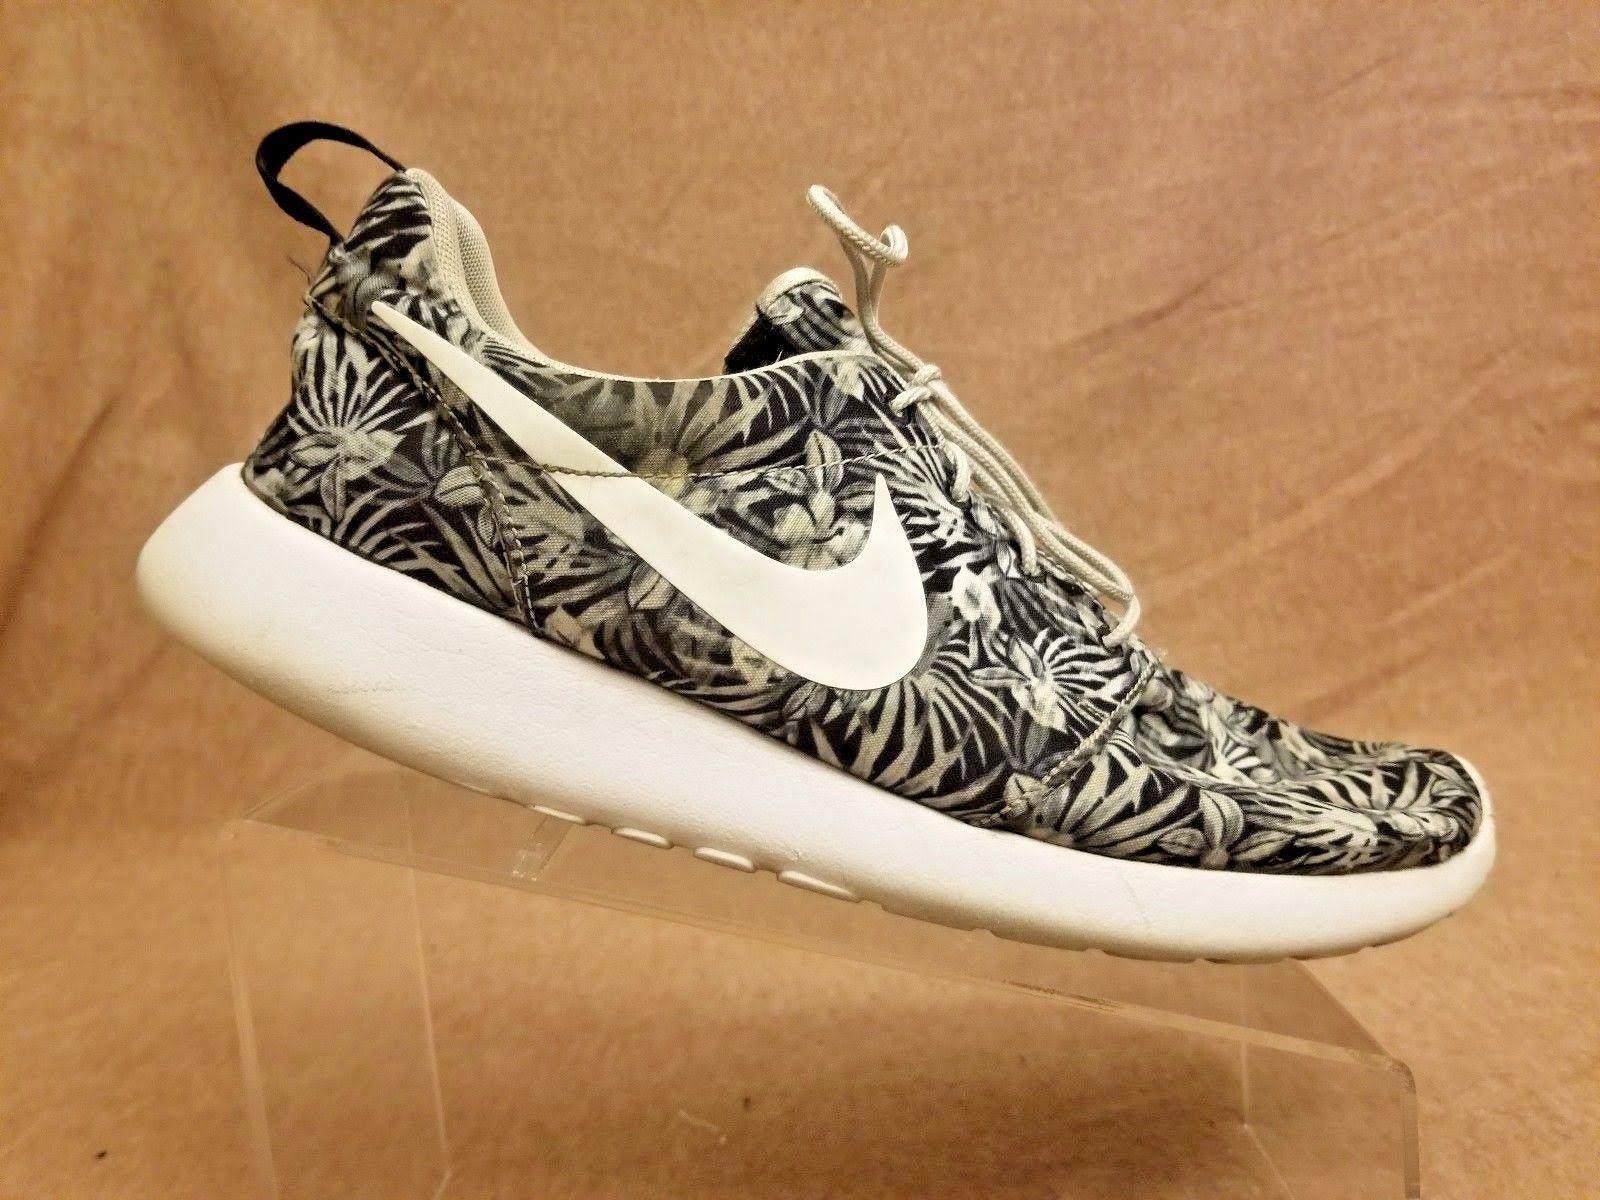 on sale 1171d 63ce7 Nike Roshe One Print Prem 833620-010 Men Black White Floral ...